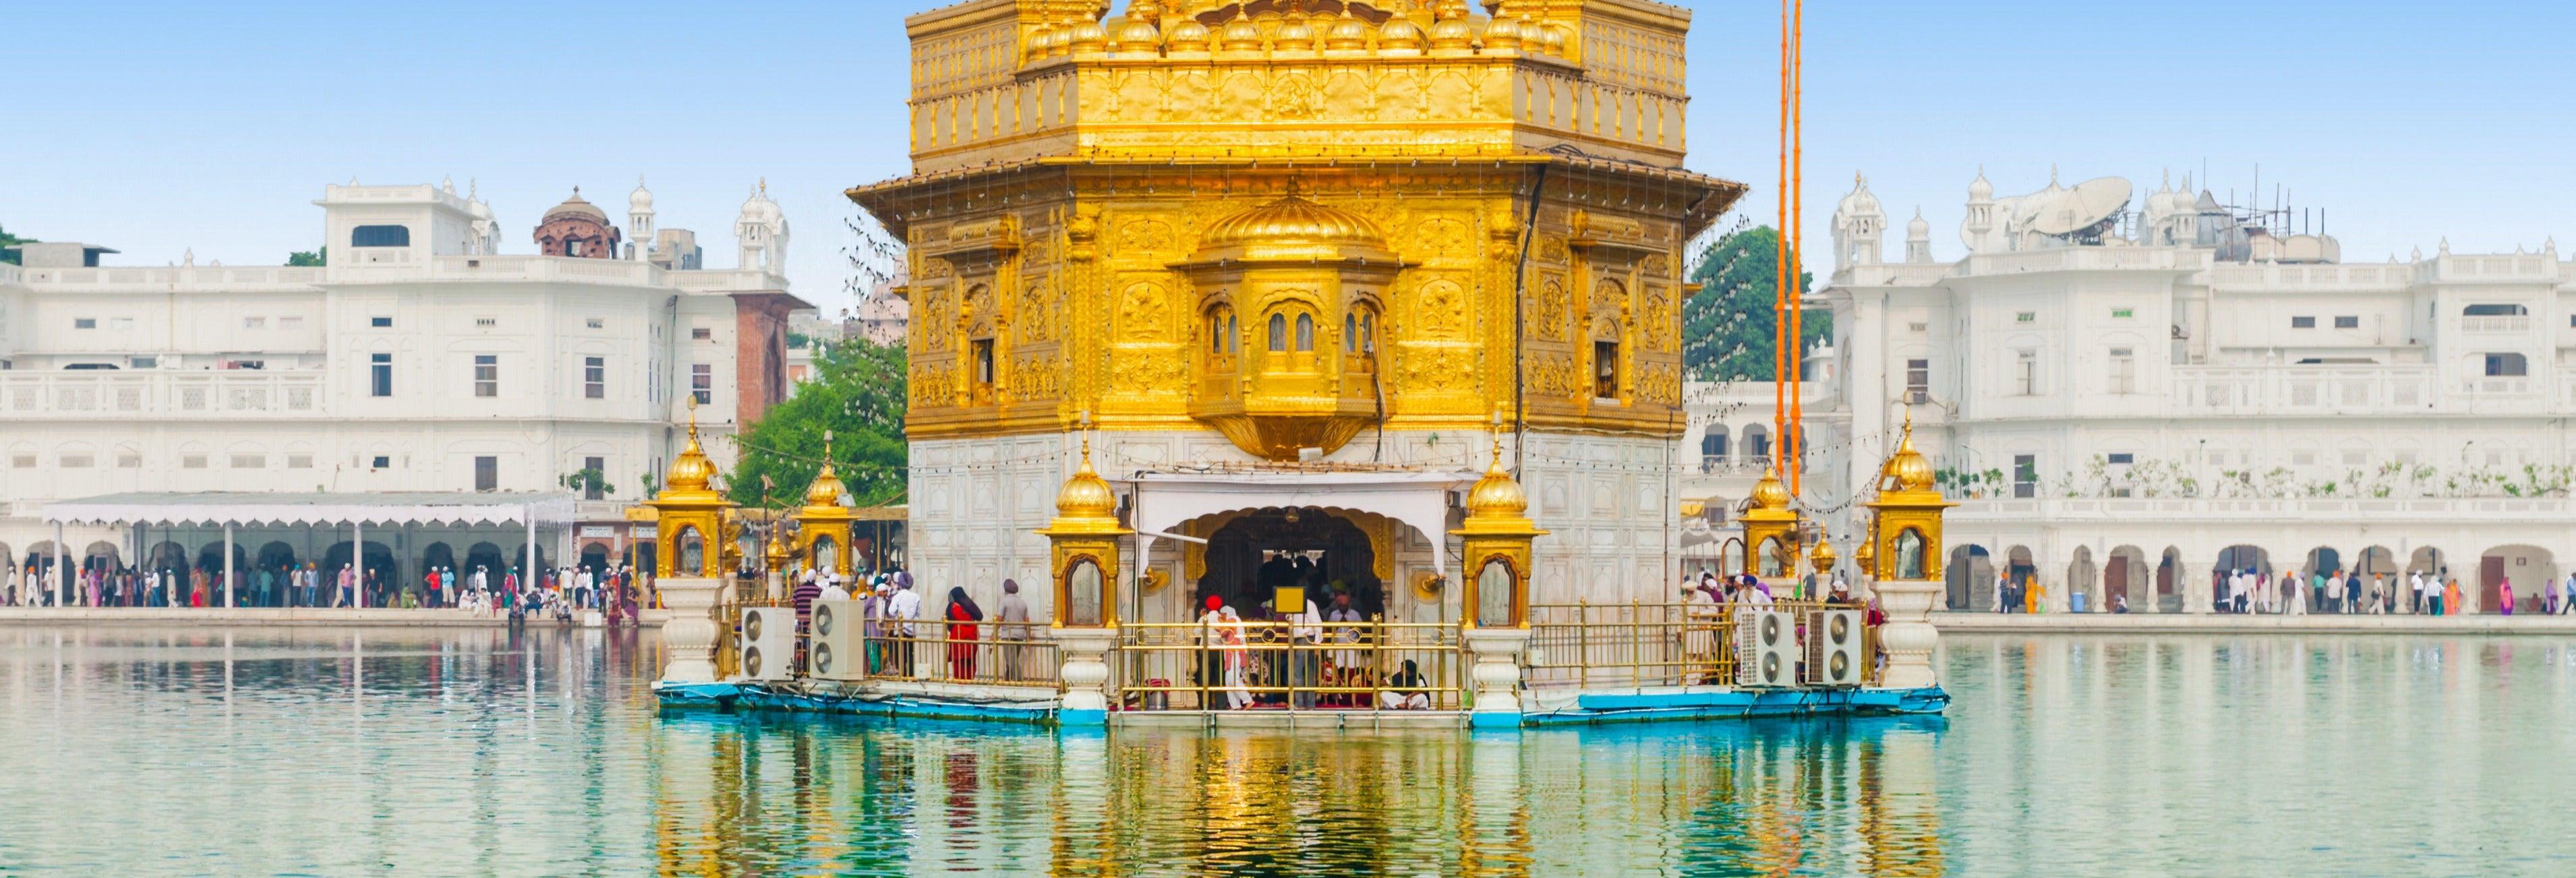 Tour pelo Templo Dourado